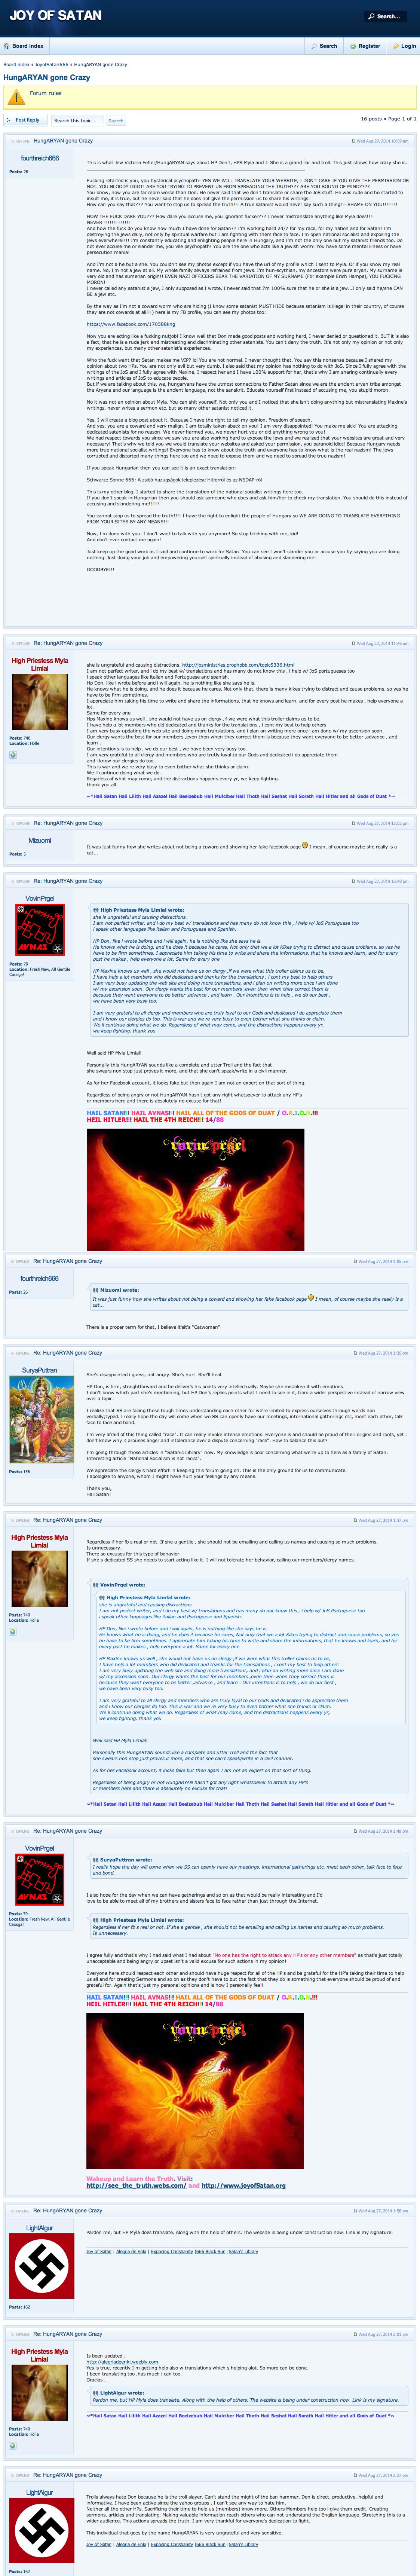 Vovinprgel Hungarian Cultist Nazis Neo Nazis The Joy Of Satan